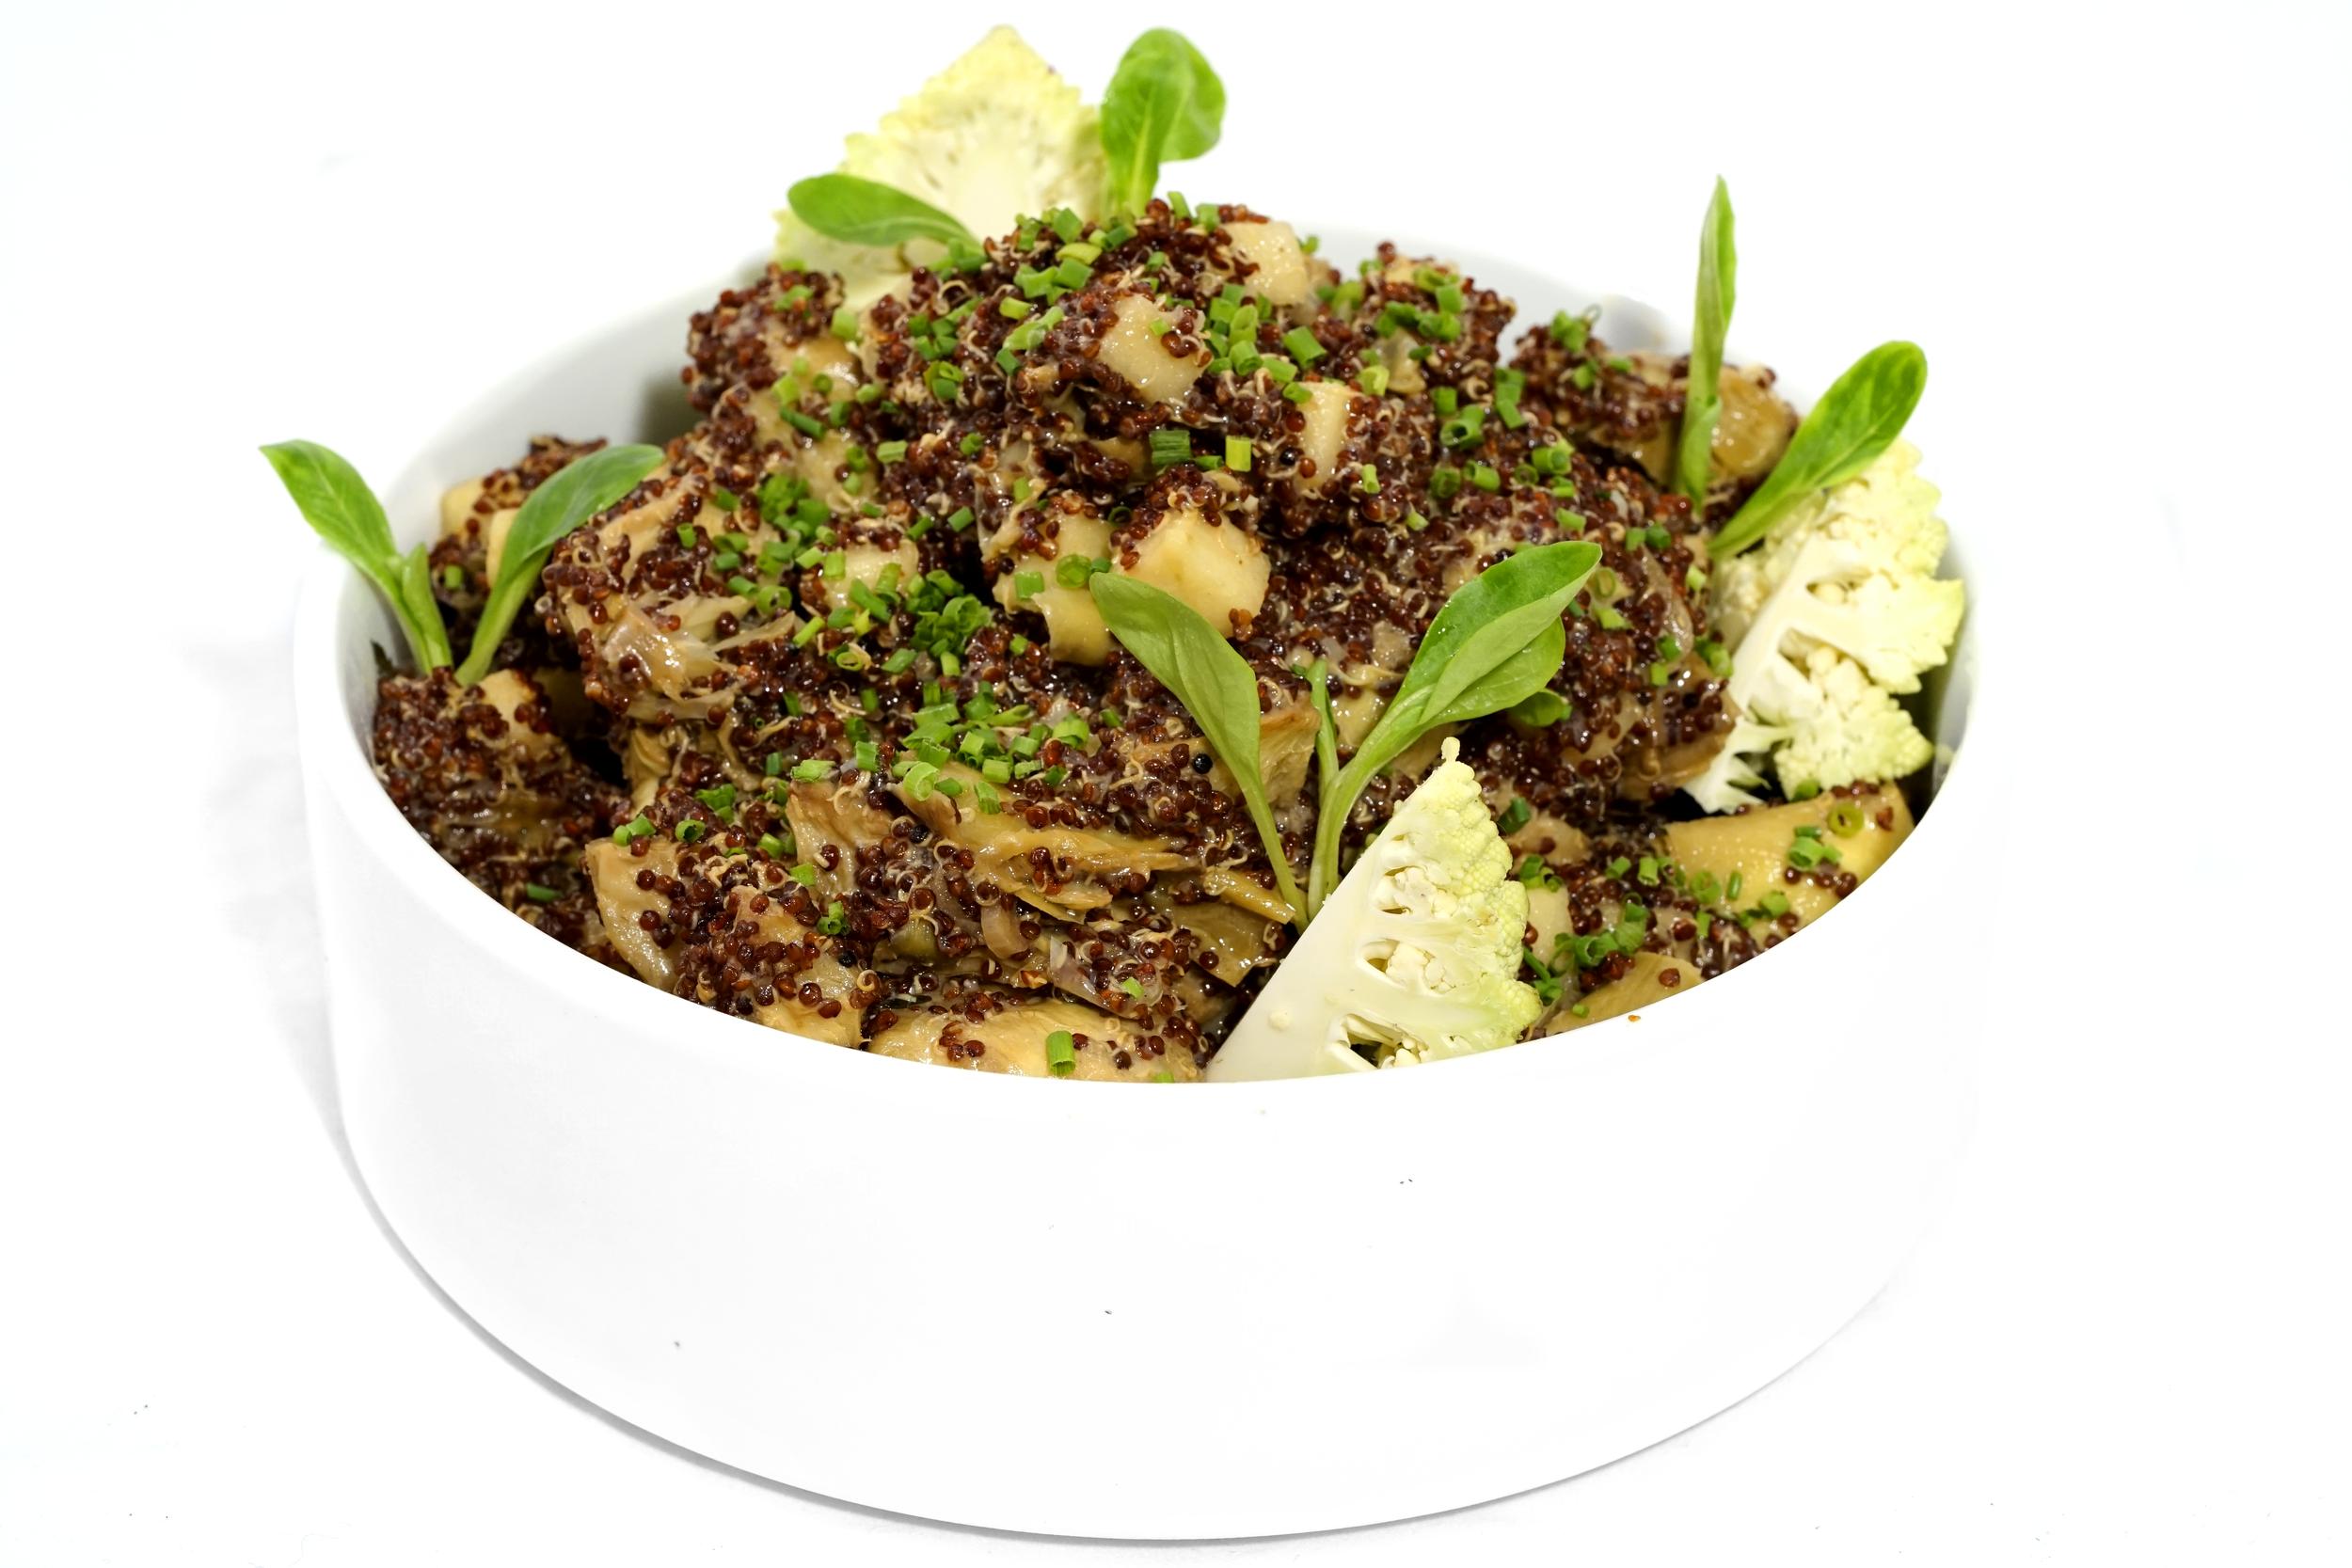 Roasted Artichokes & Quinoa